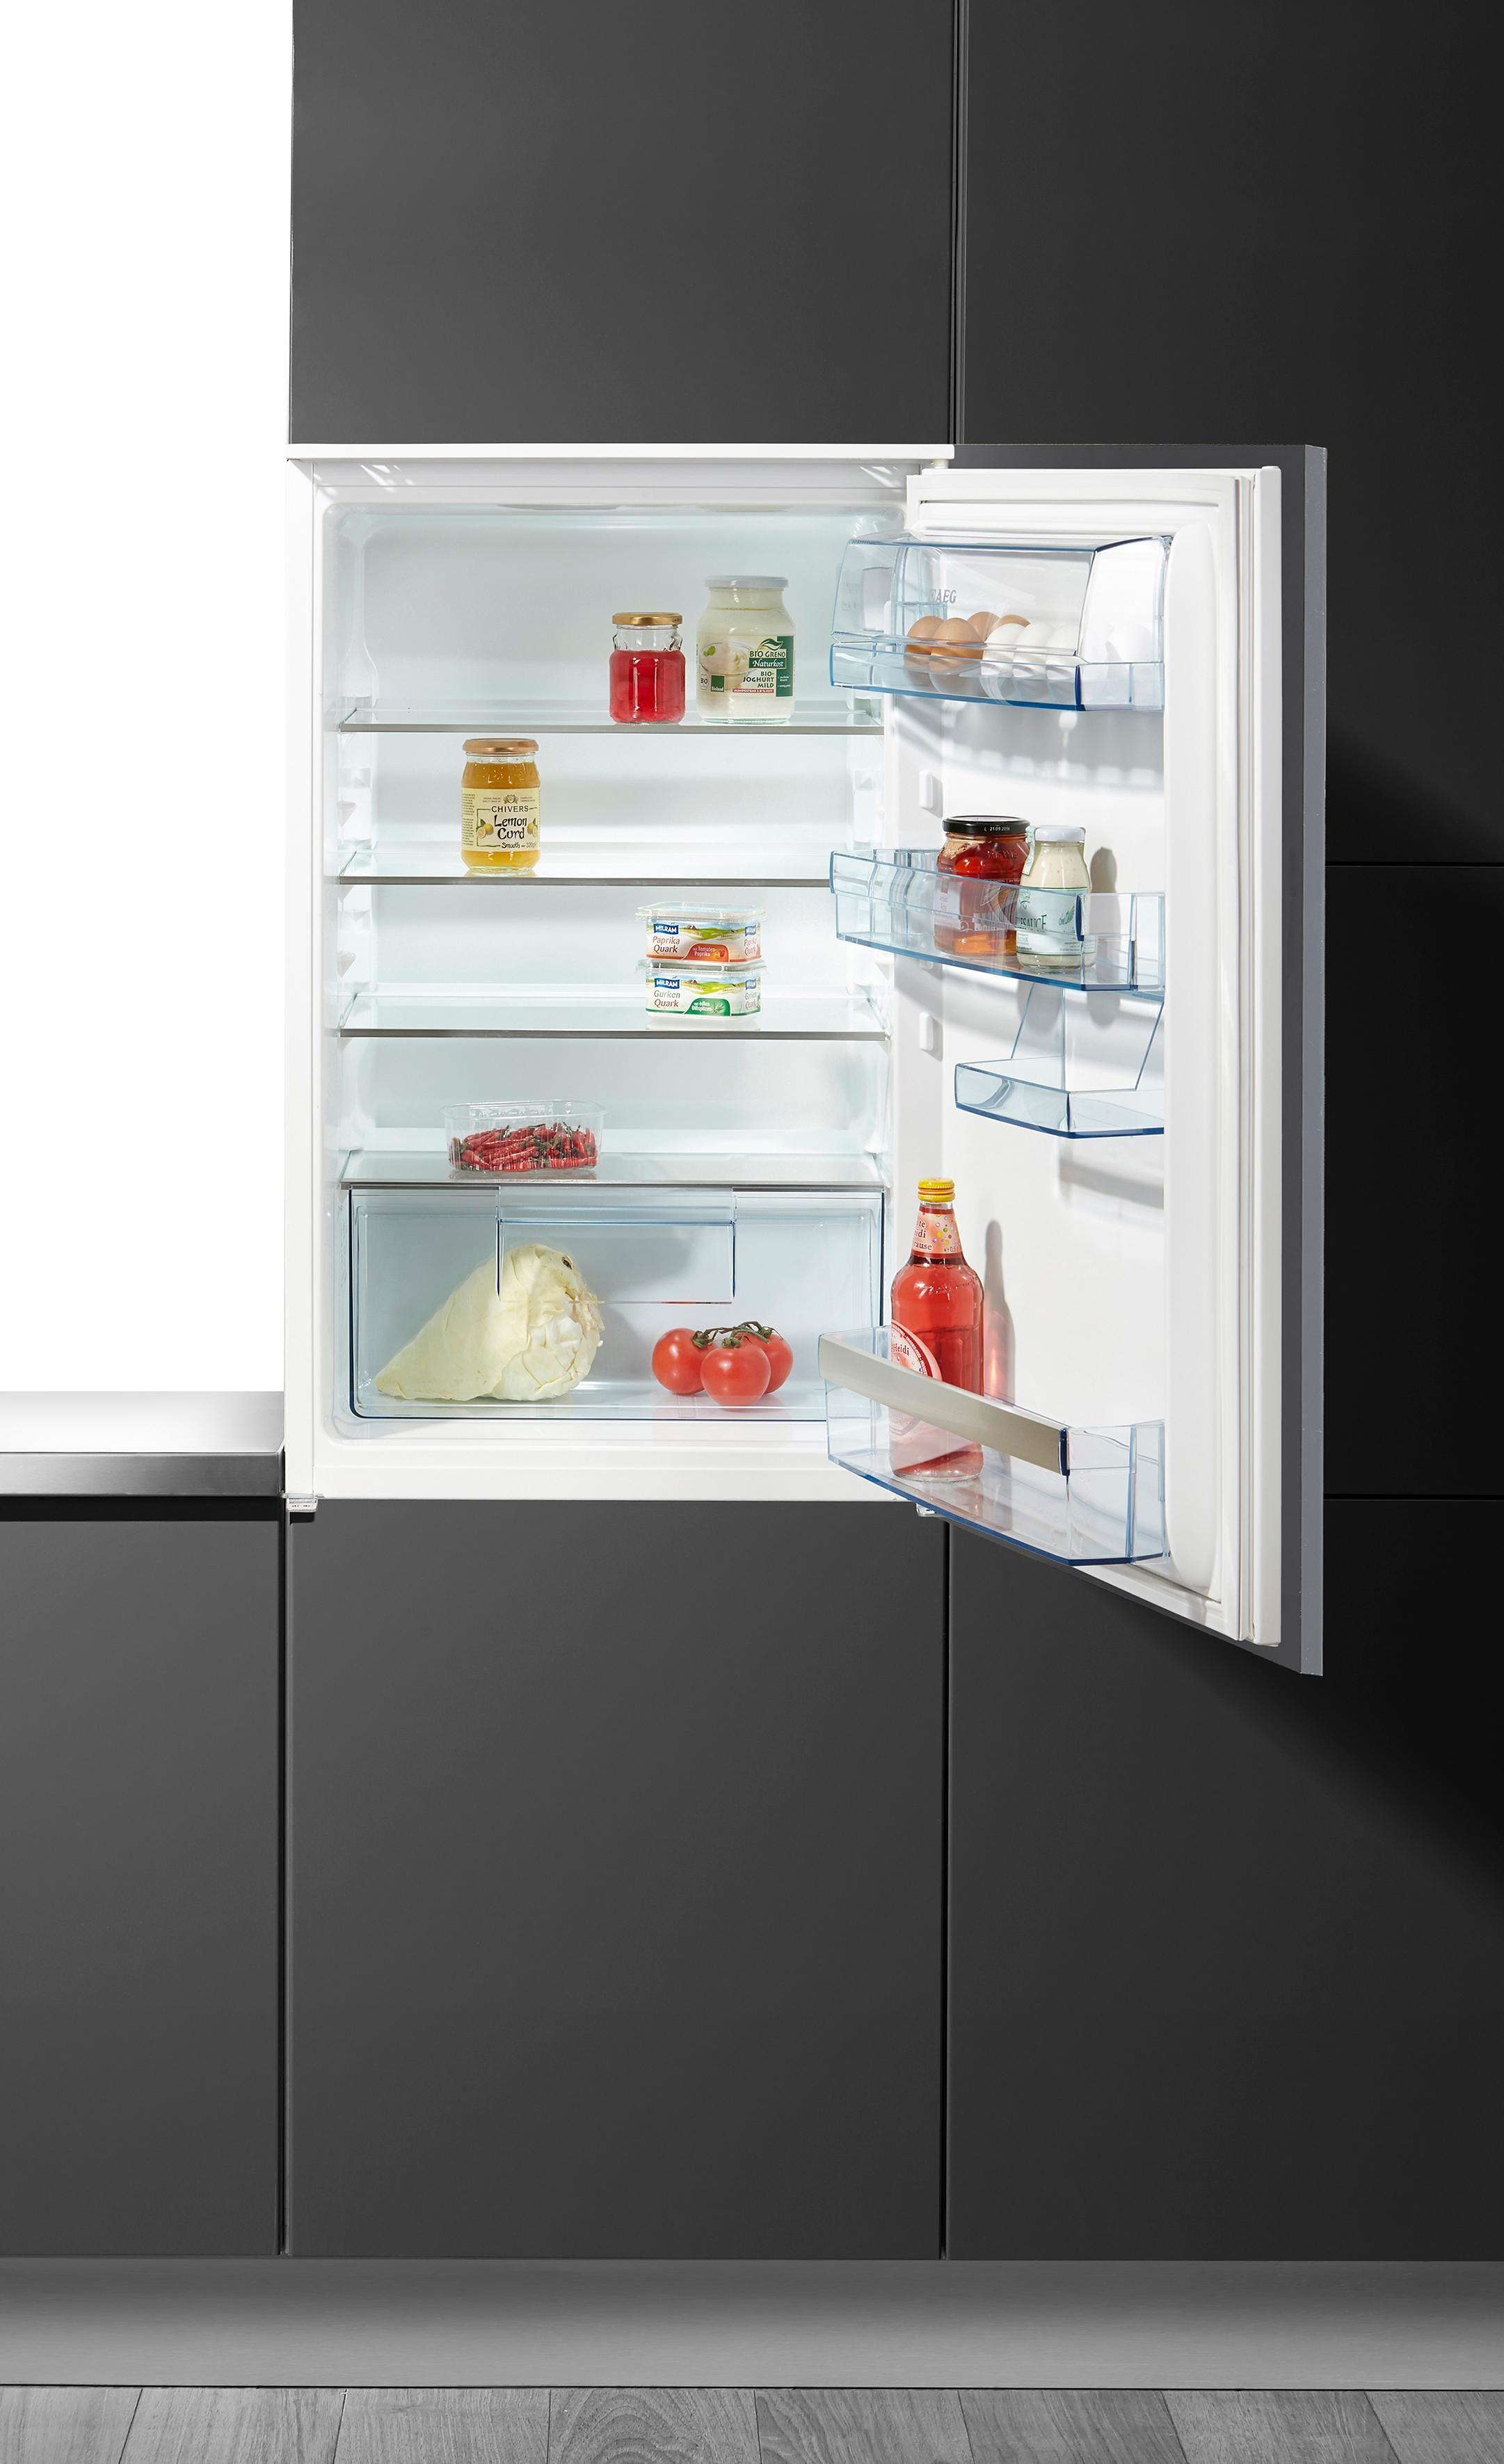 AEG Vollintegrierbarer Einbaukühlschrank S6.0S0 / SANTO, A++, 87,3 cm